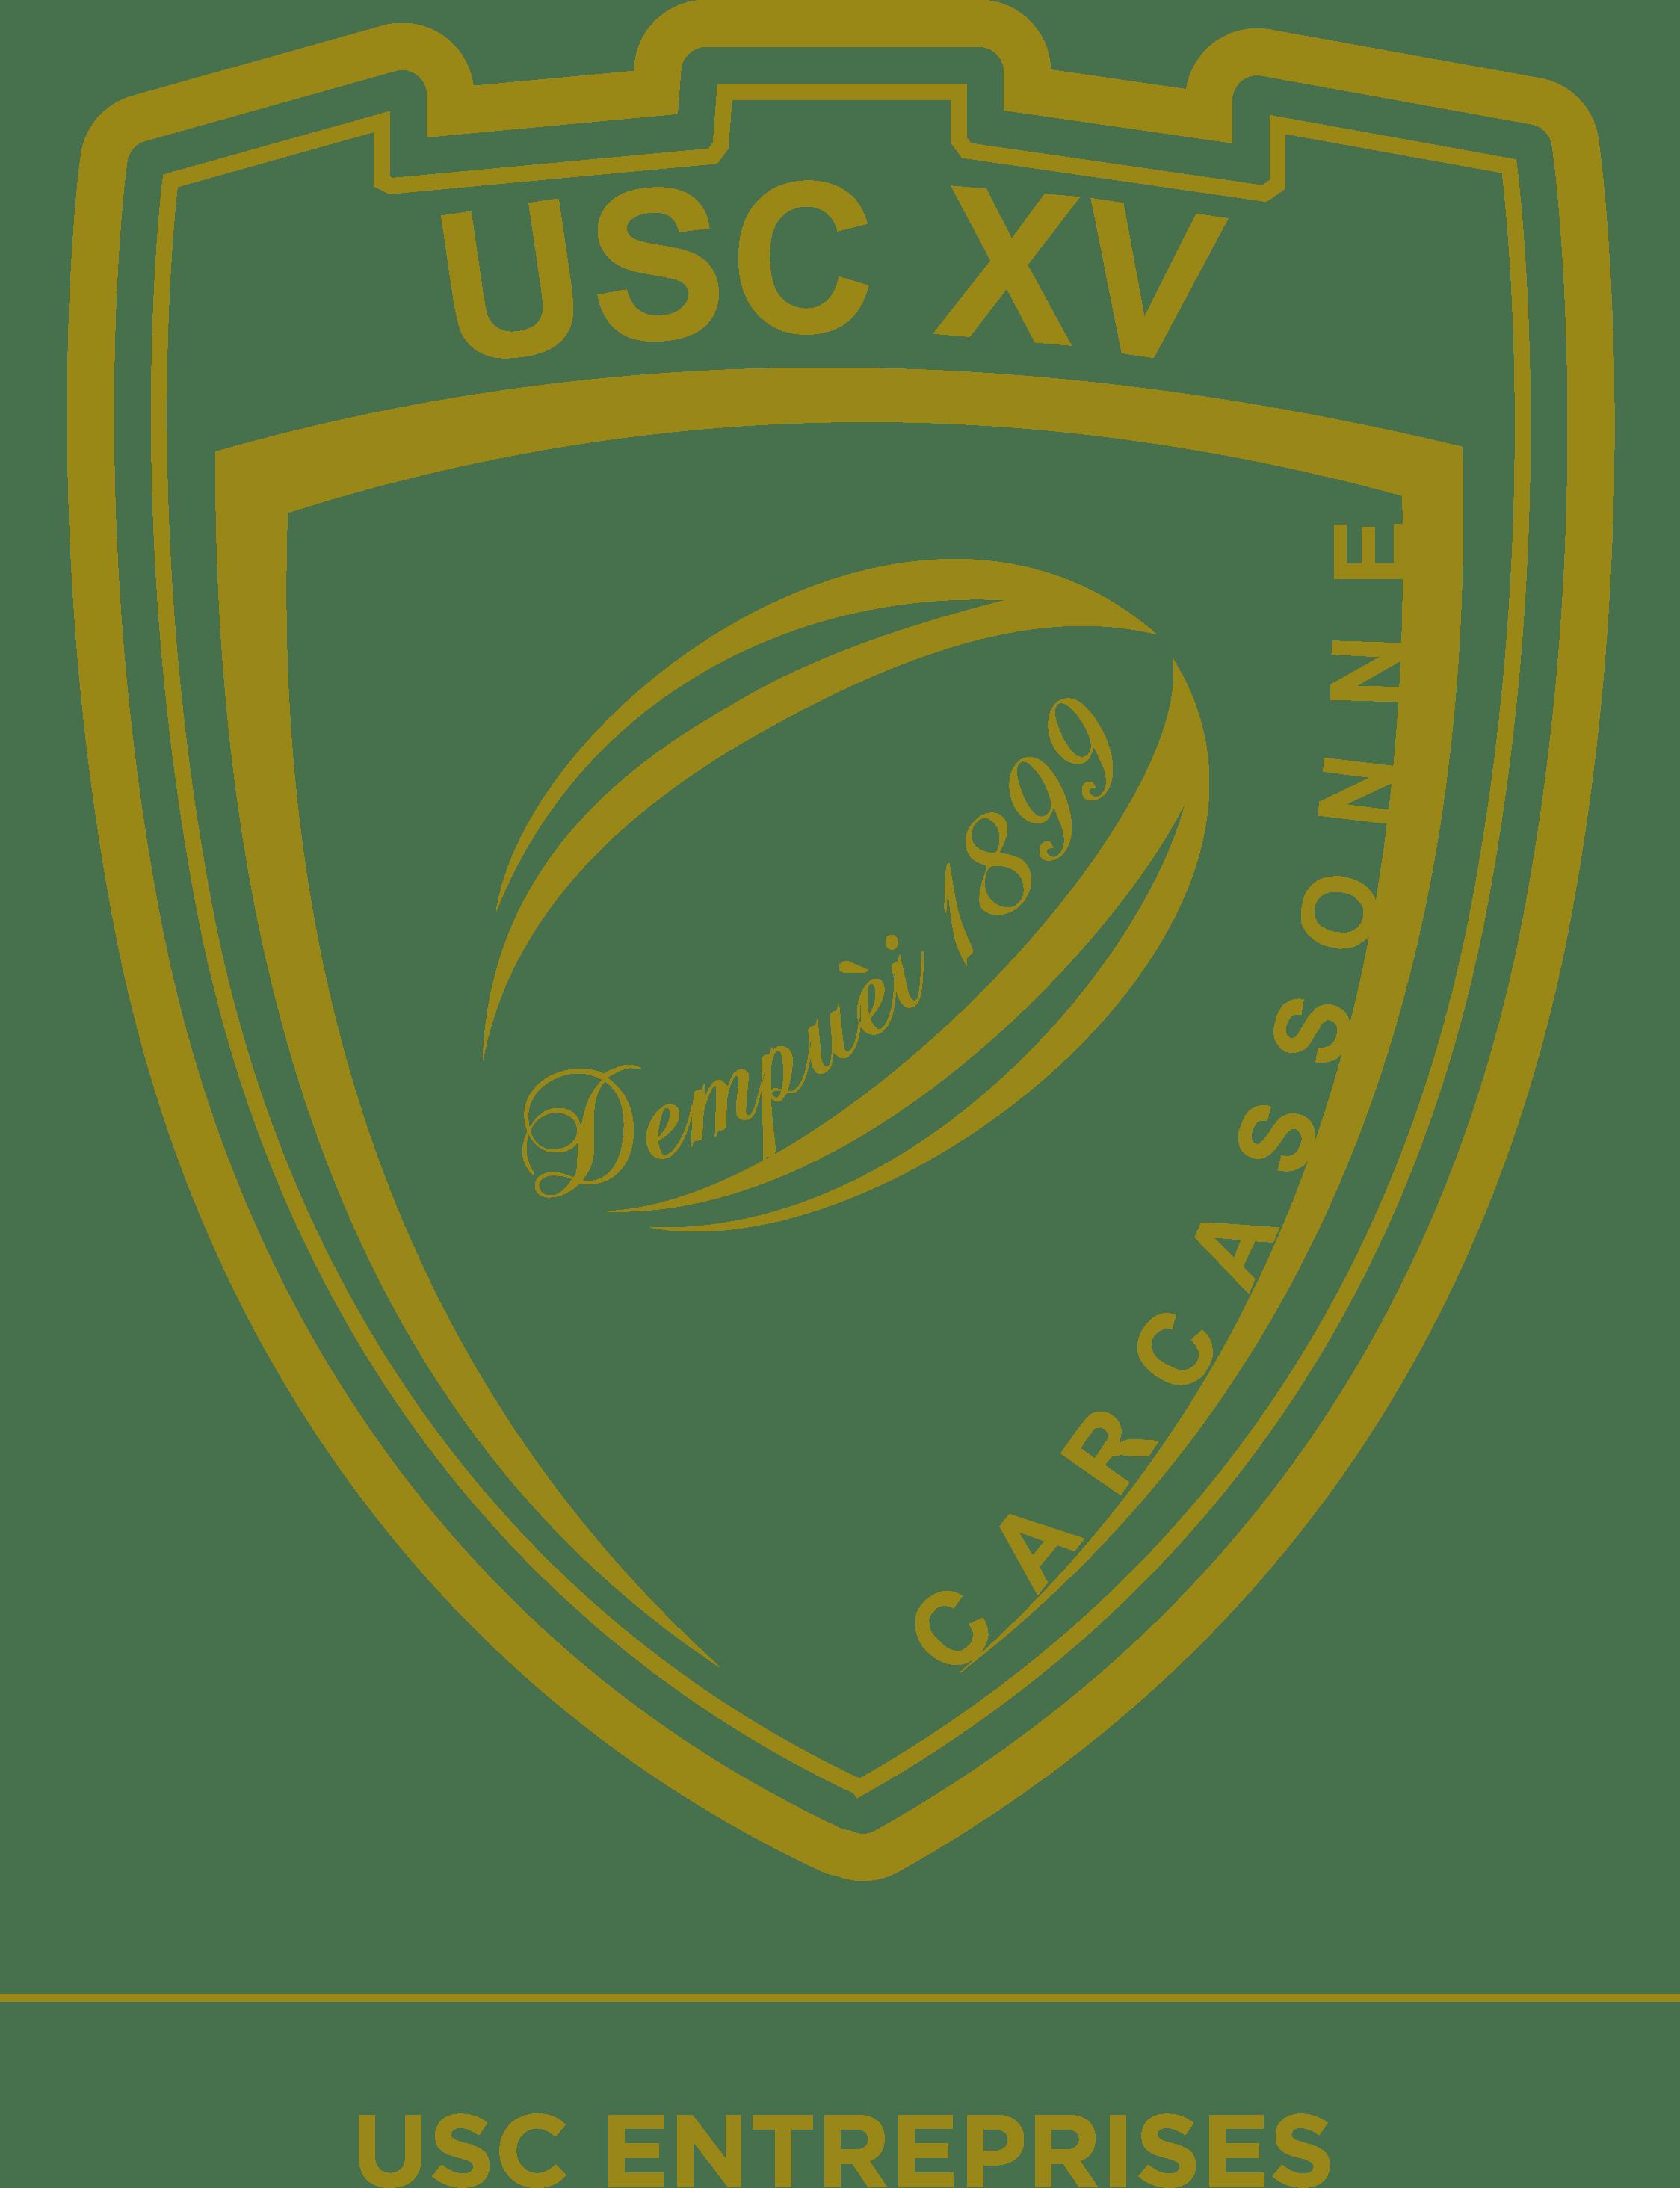 USC Club Entreprises